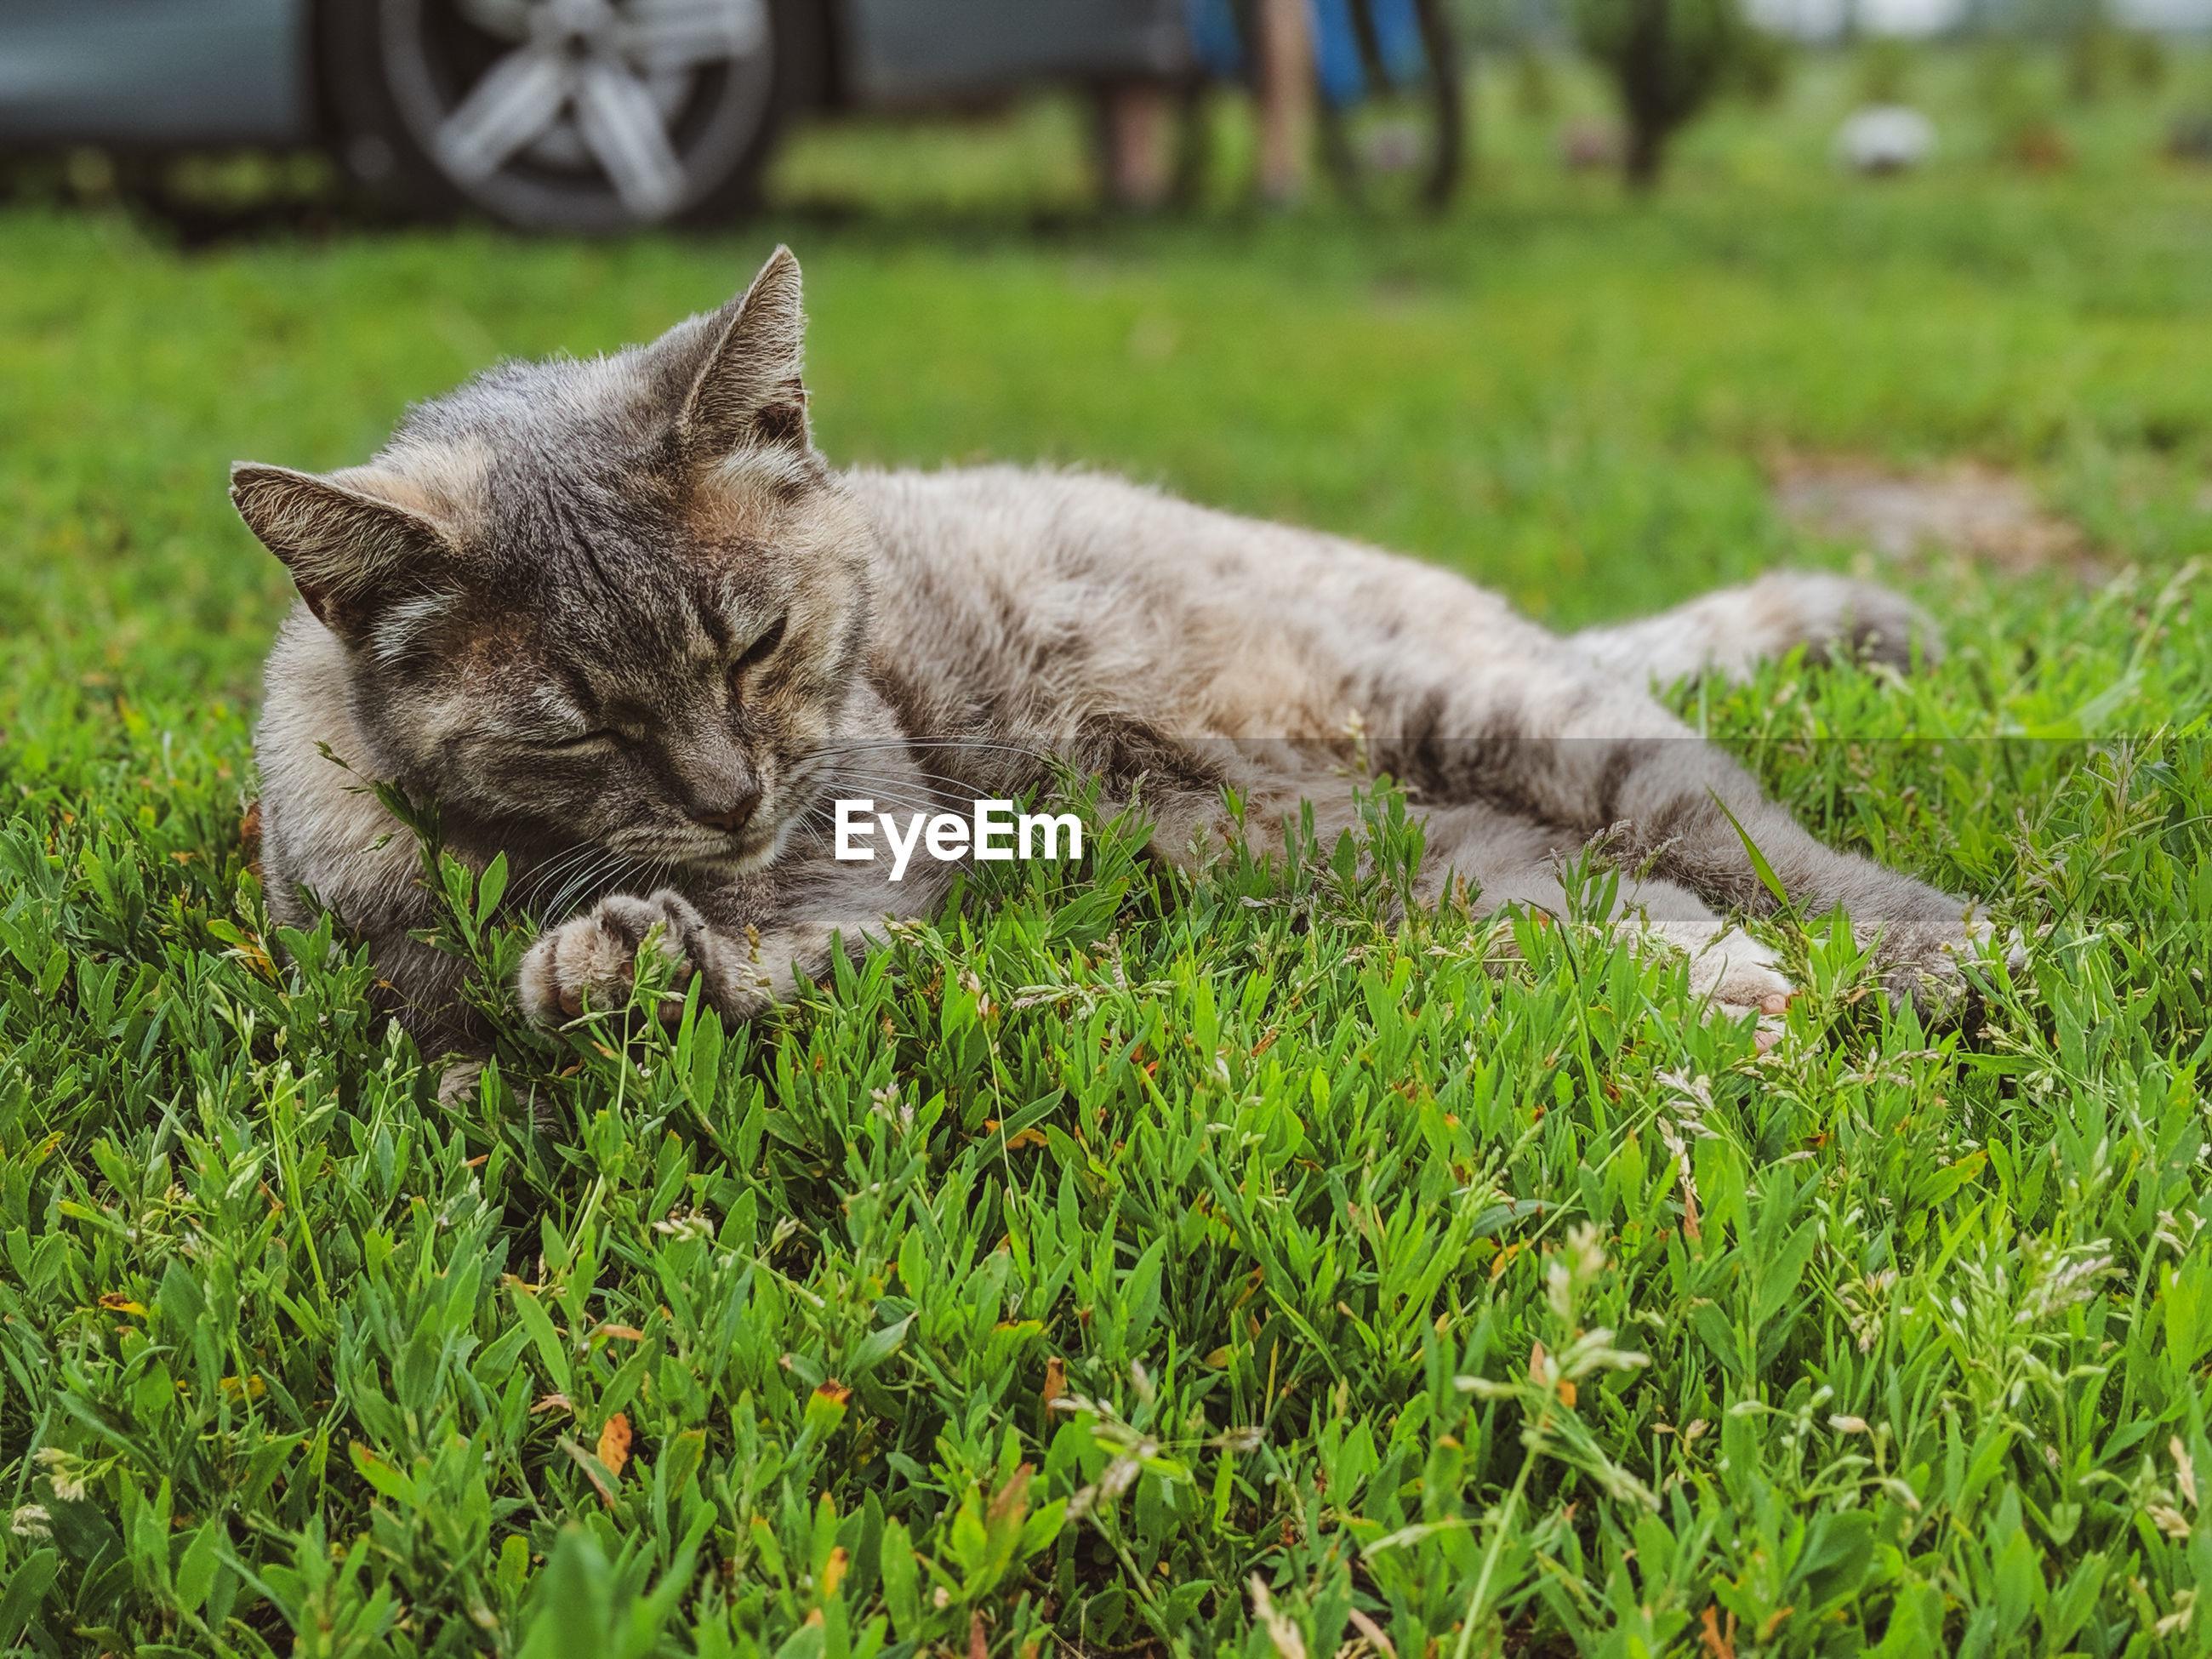 CAT RESTING ON GRASS